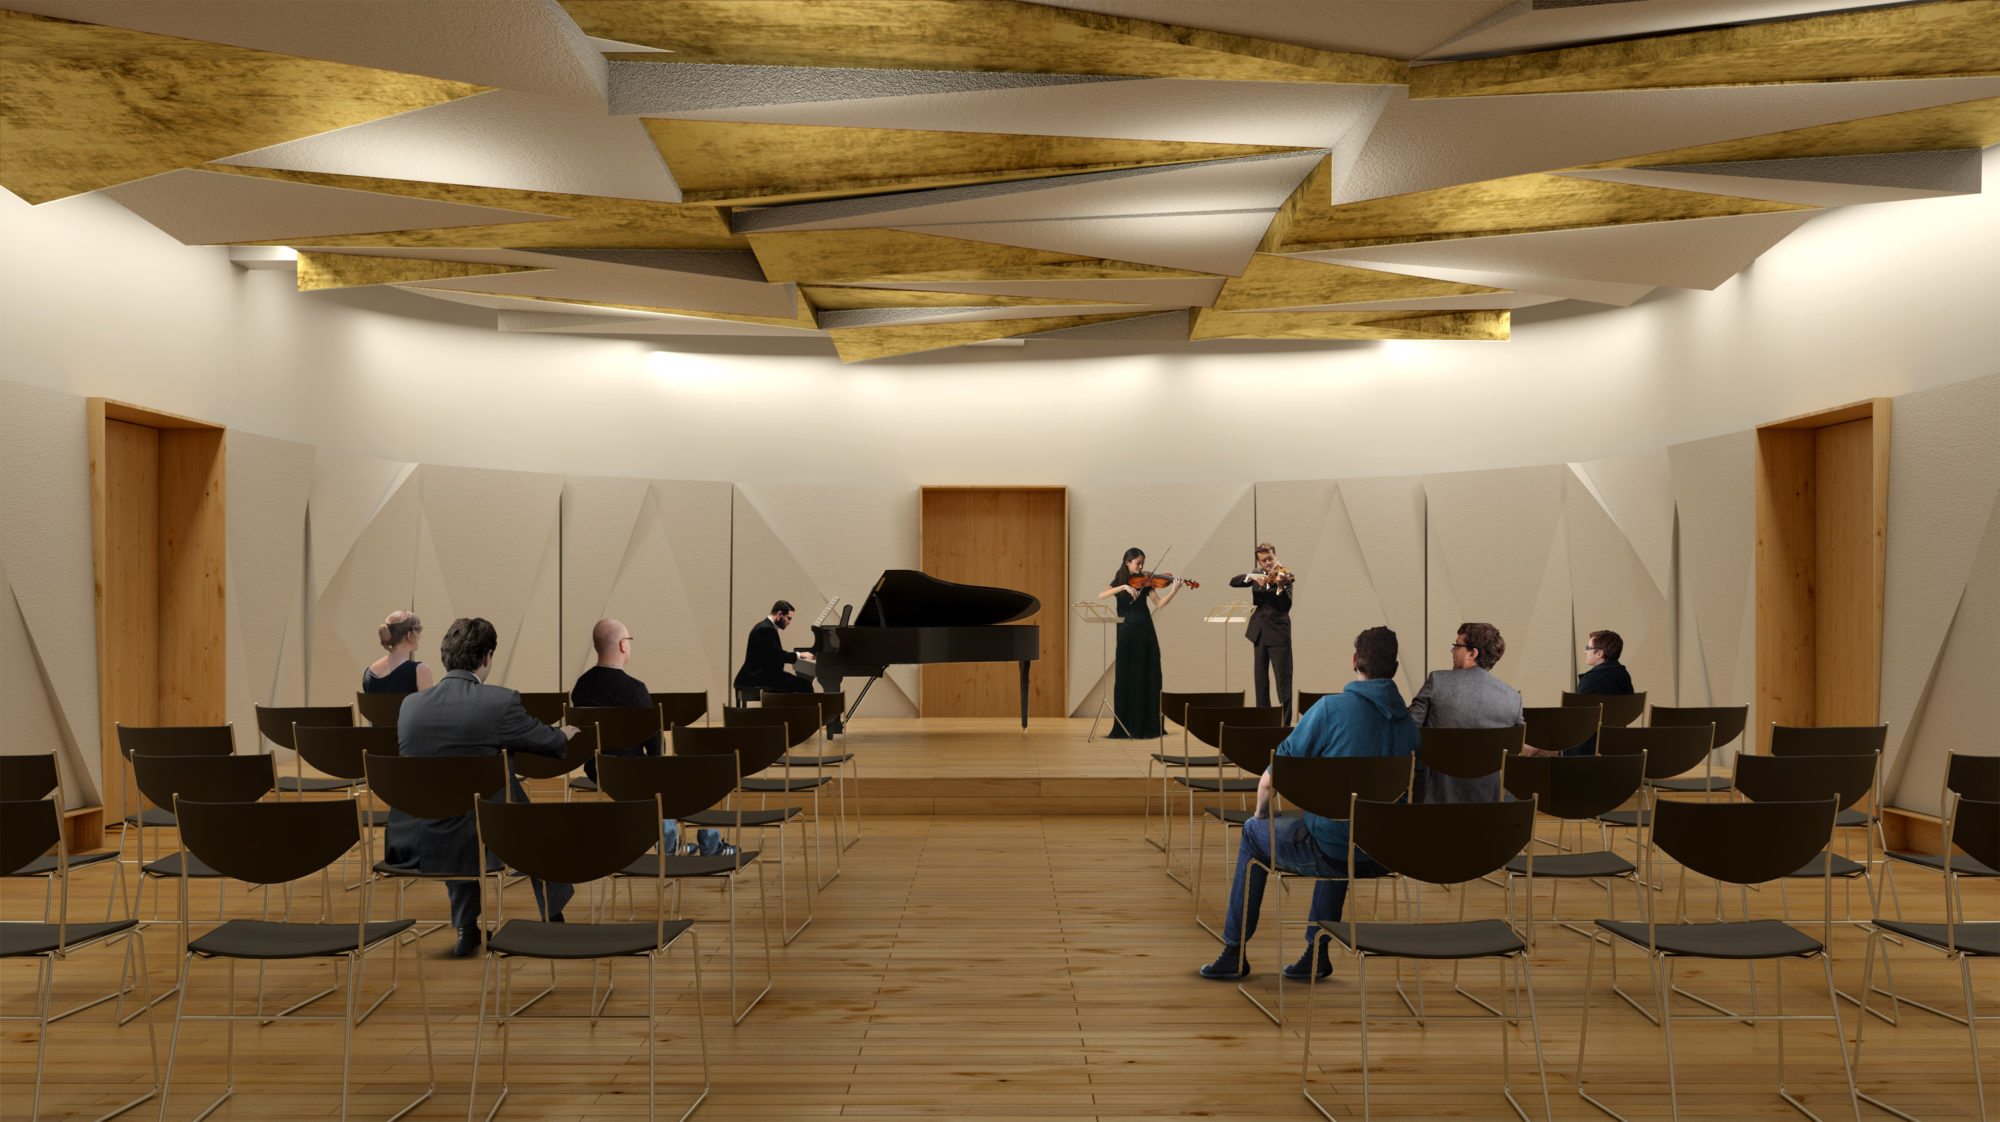 Geneva Music Conservatory - Garcés - de Seta - Bonet